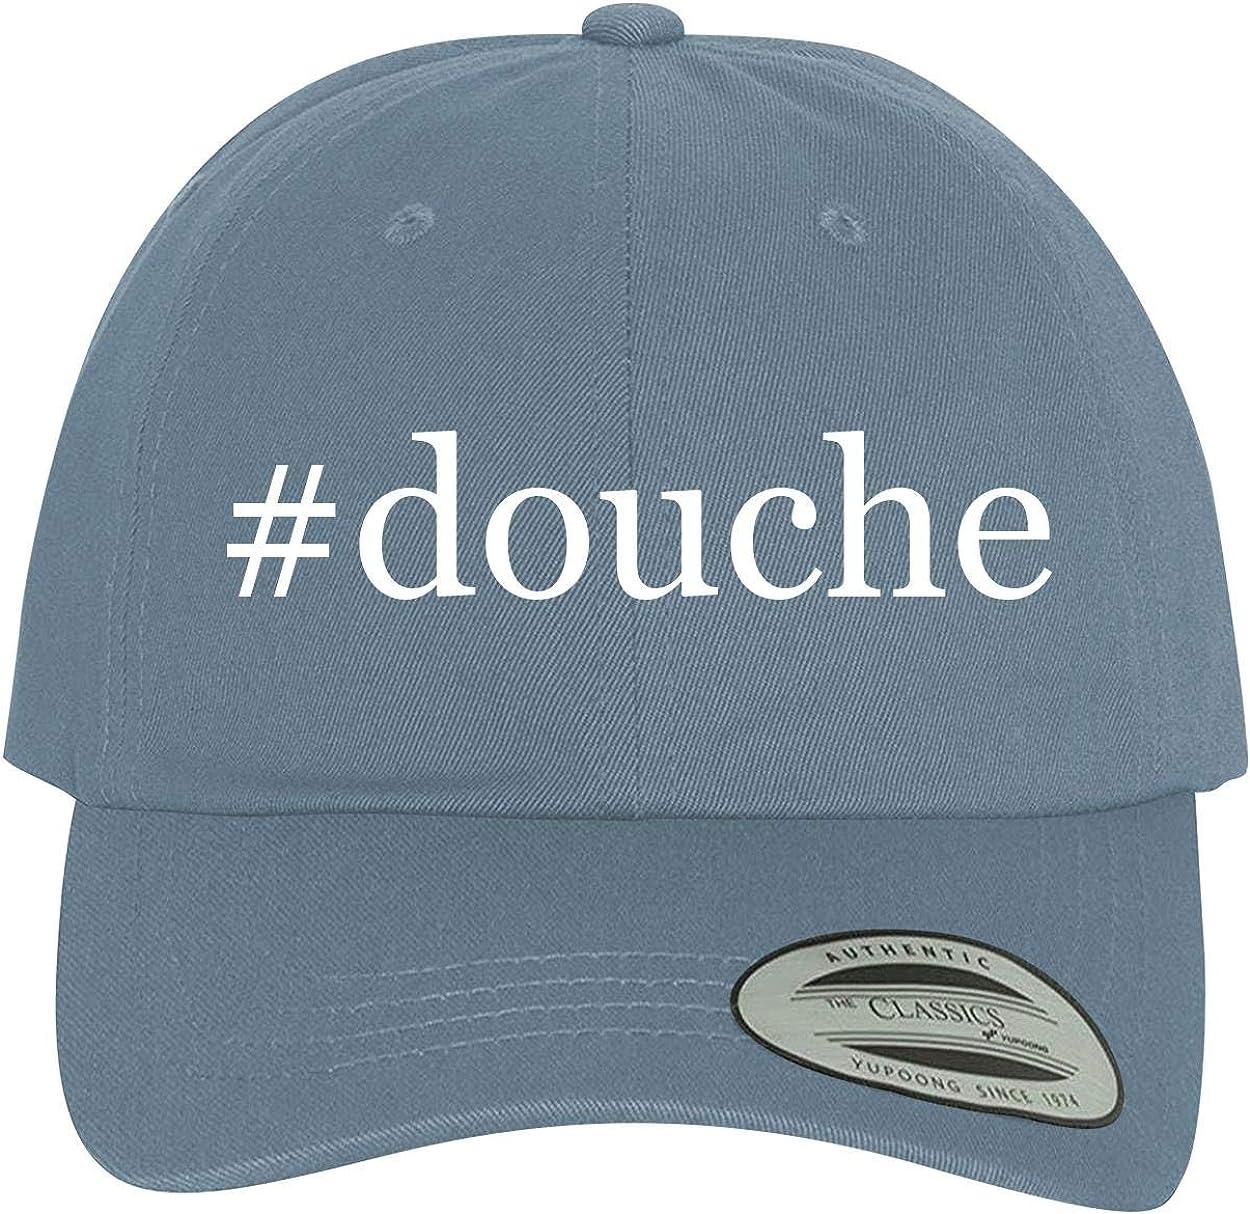 Comfortable Dad Hat Baseball Cap BH Cool Designs #Douche